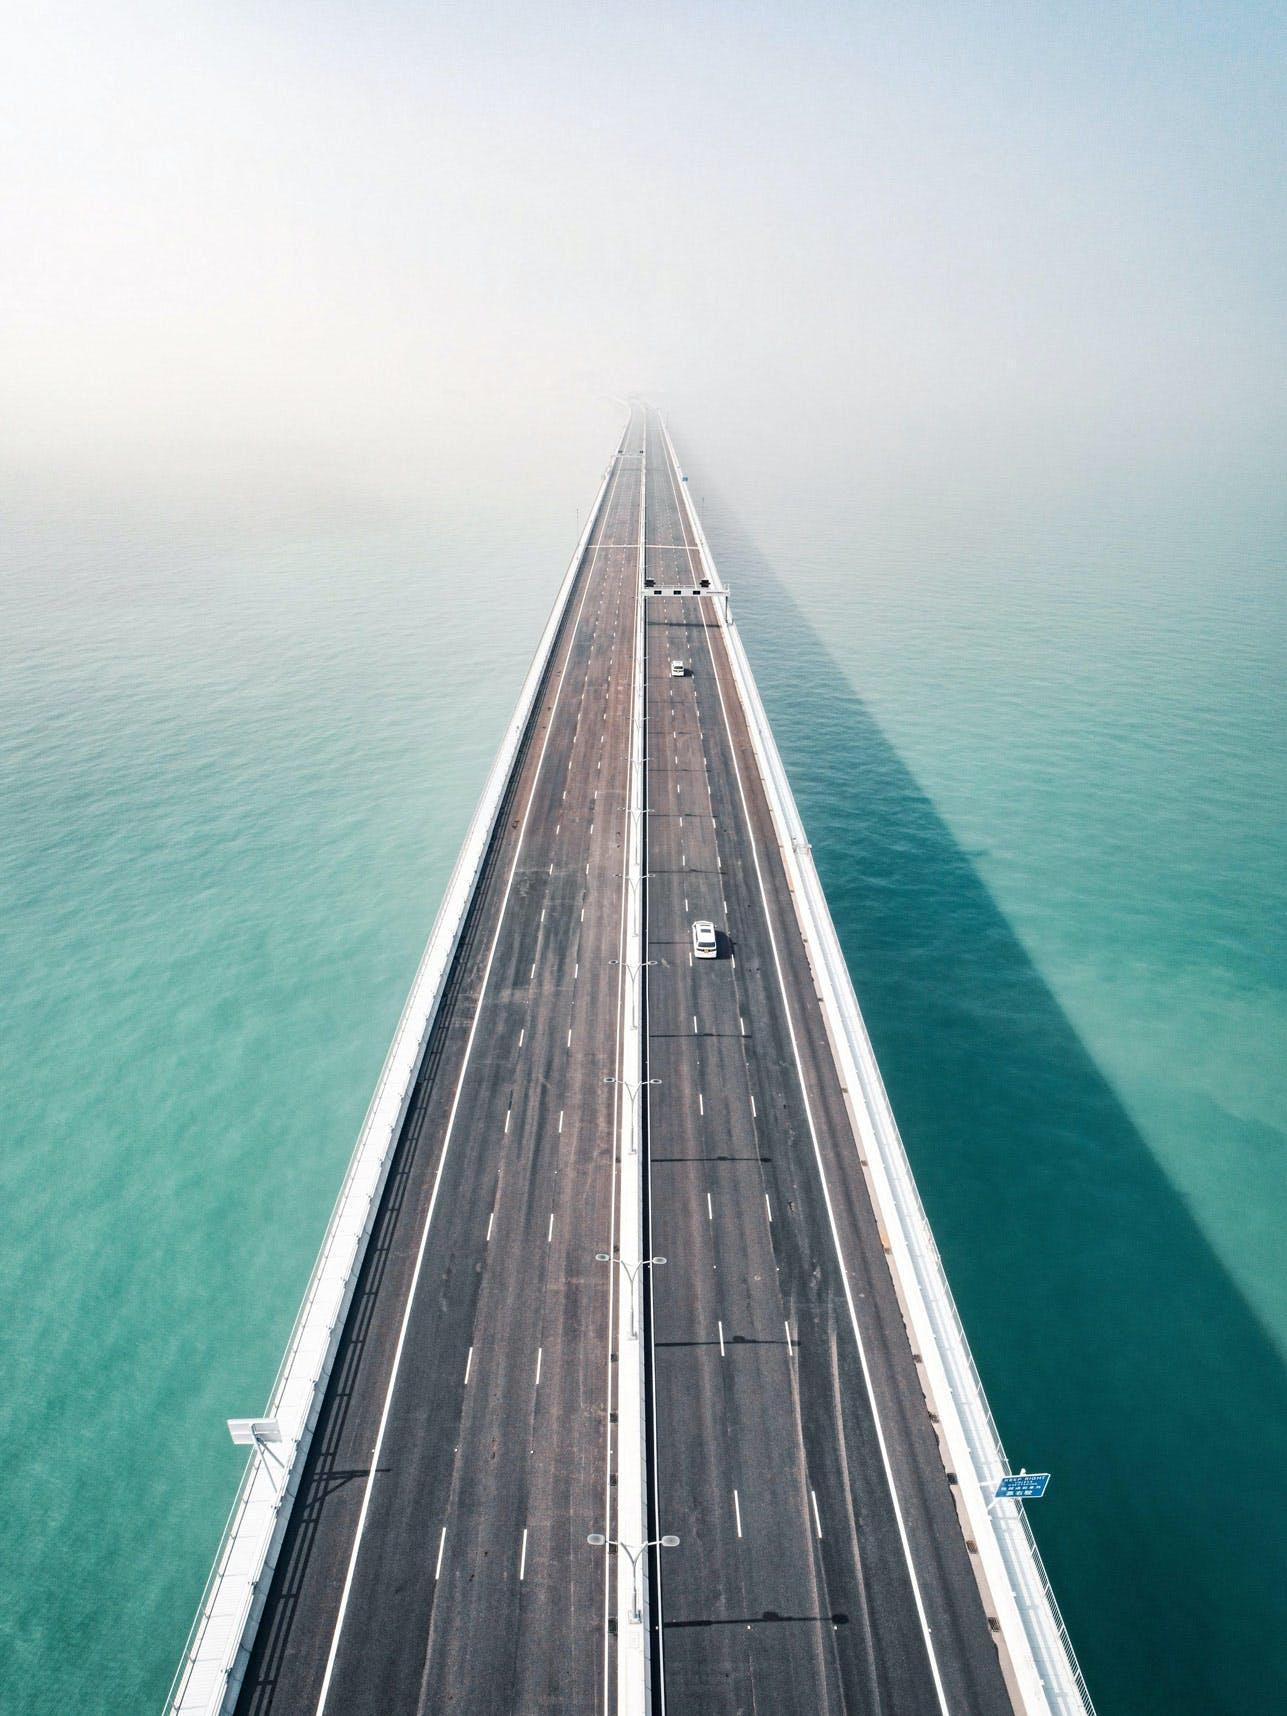 Hong Kong-Zhuhai-Macao Bridge & South China Sea Look Down